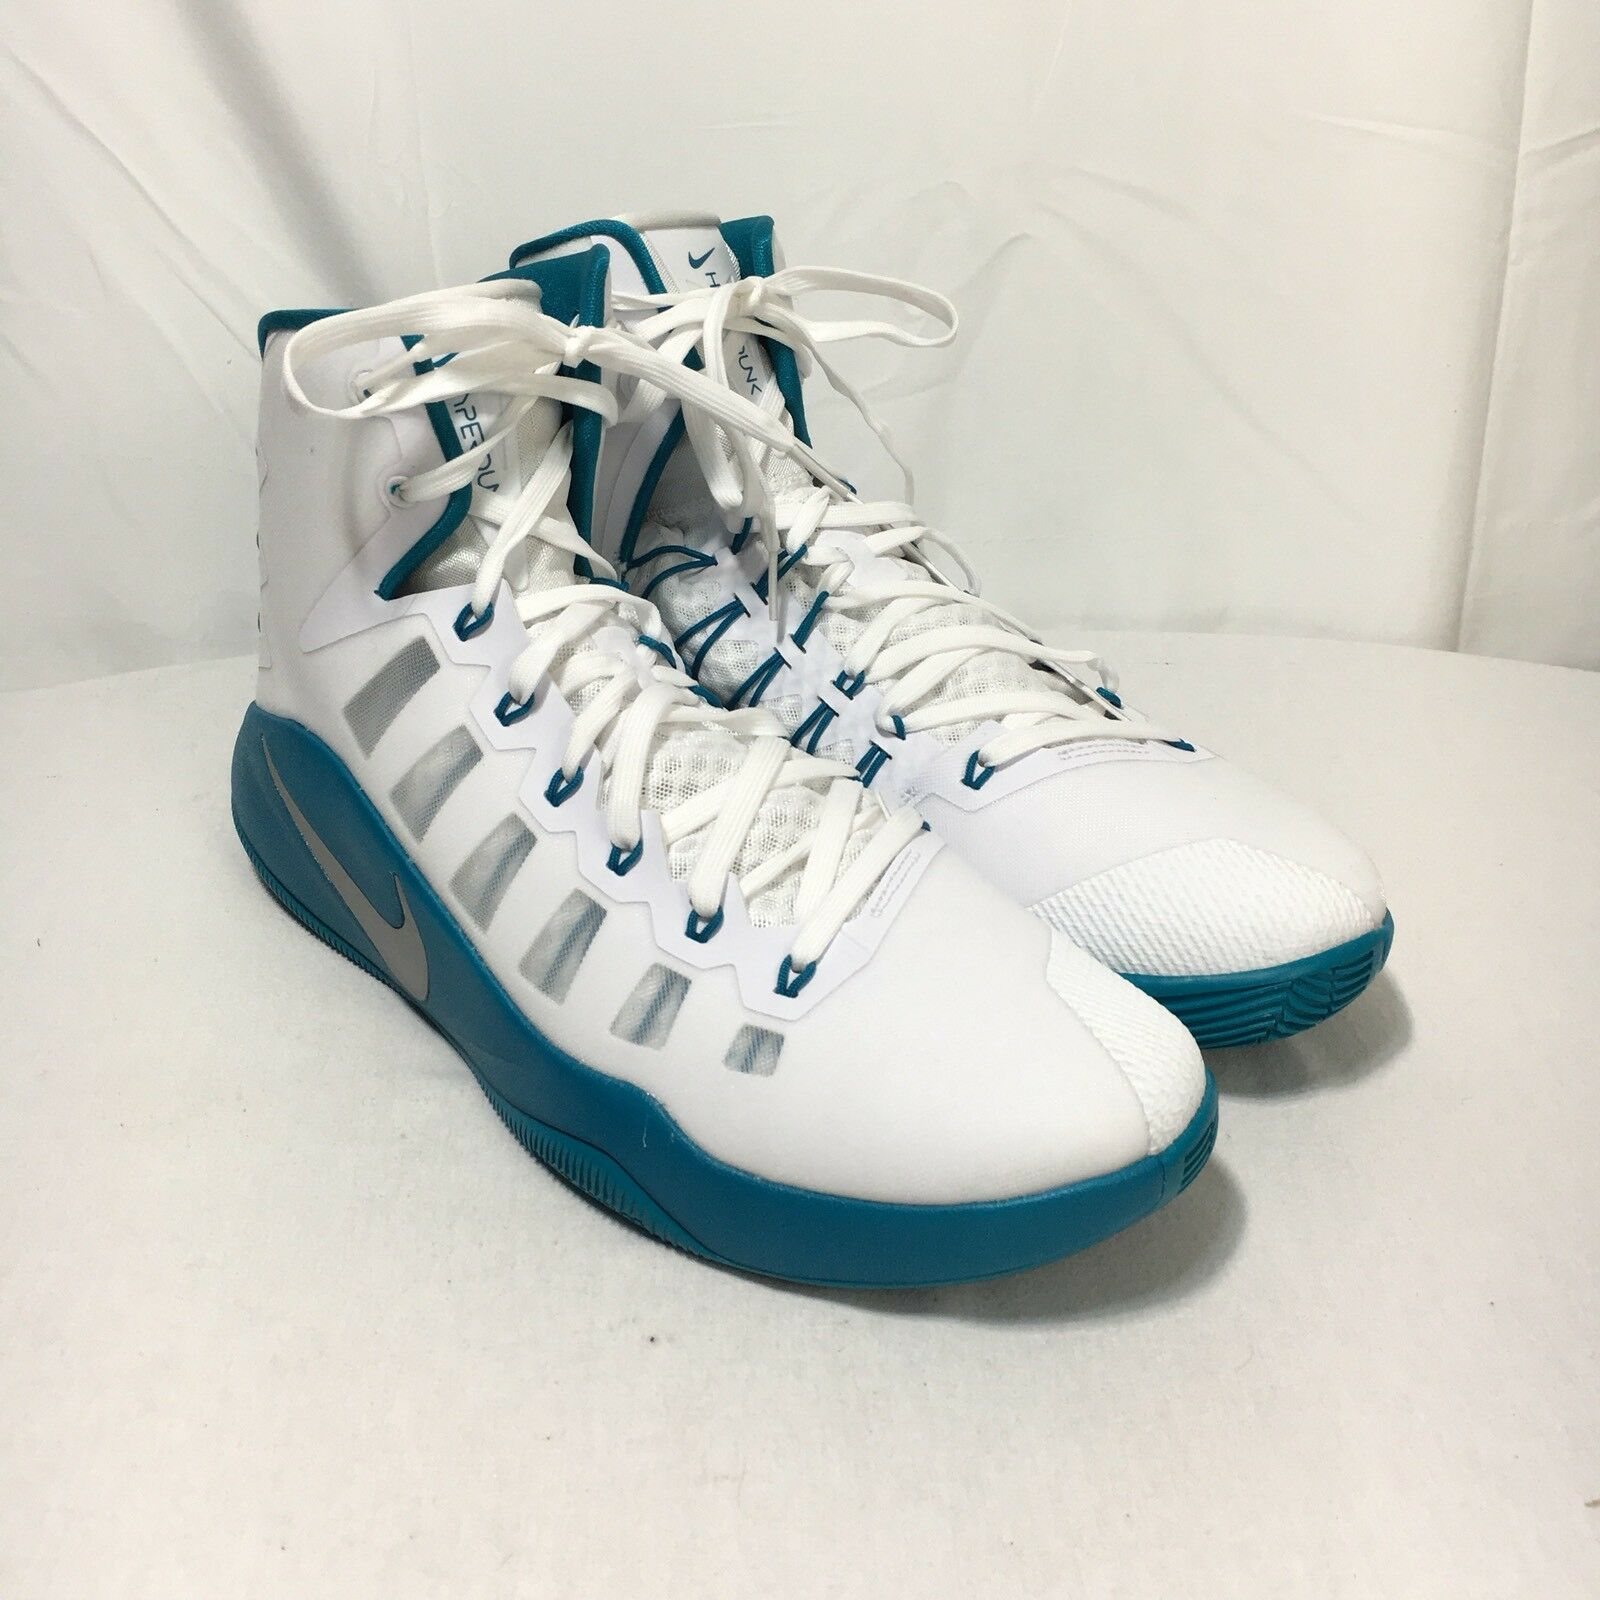 Nike Uomo Basketball Hyperdunk 2016 Uomo's Uomo's Uomo's 15 Teal blu bianca   70aef9